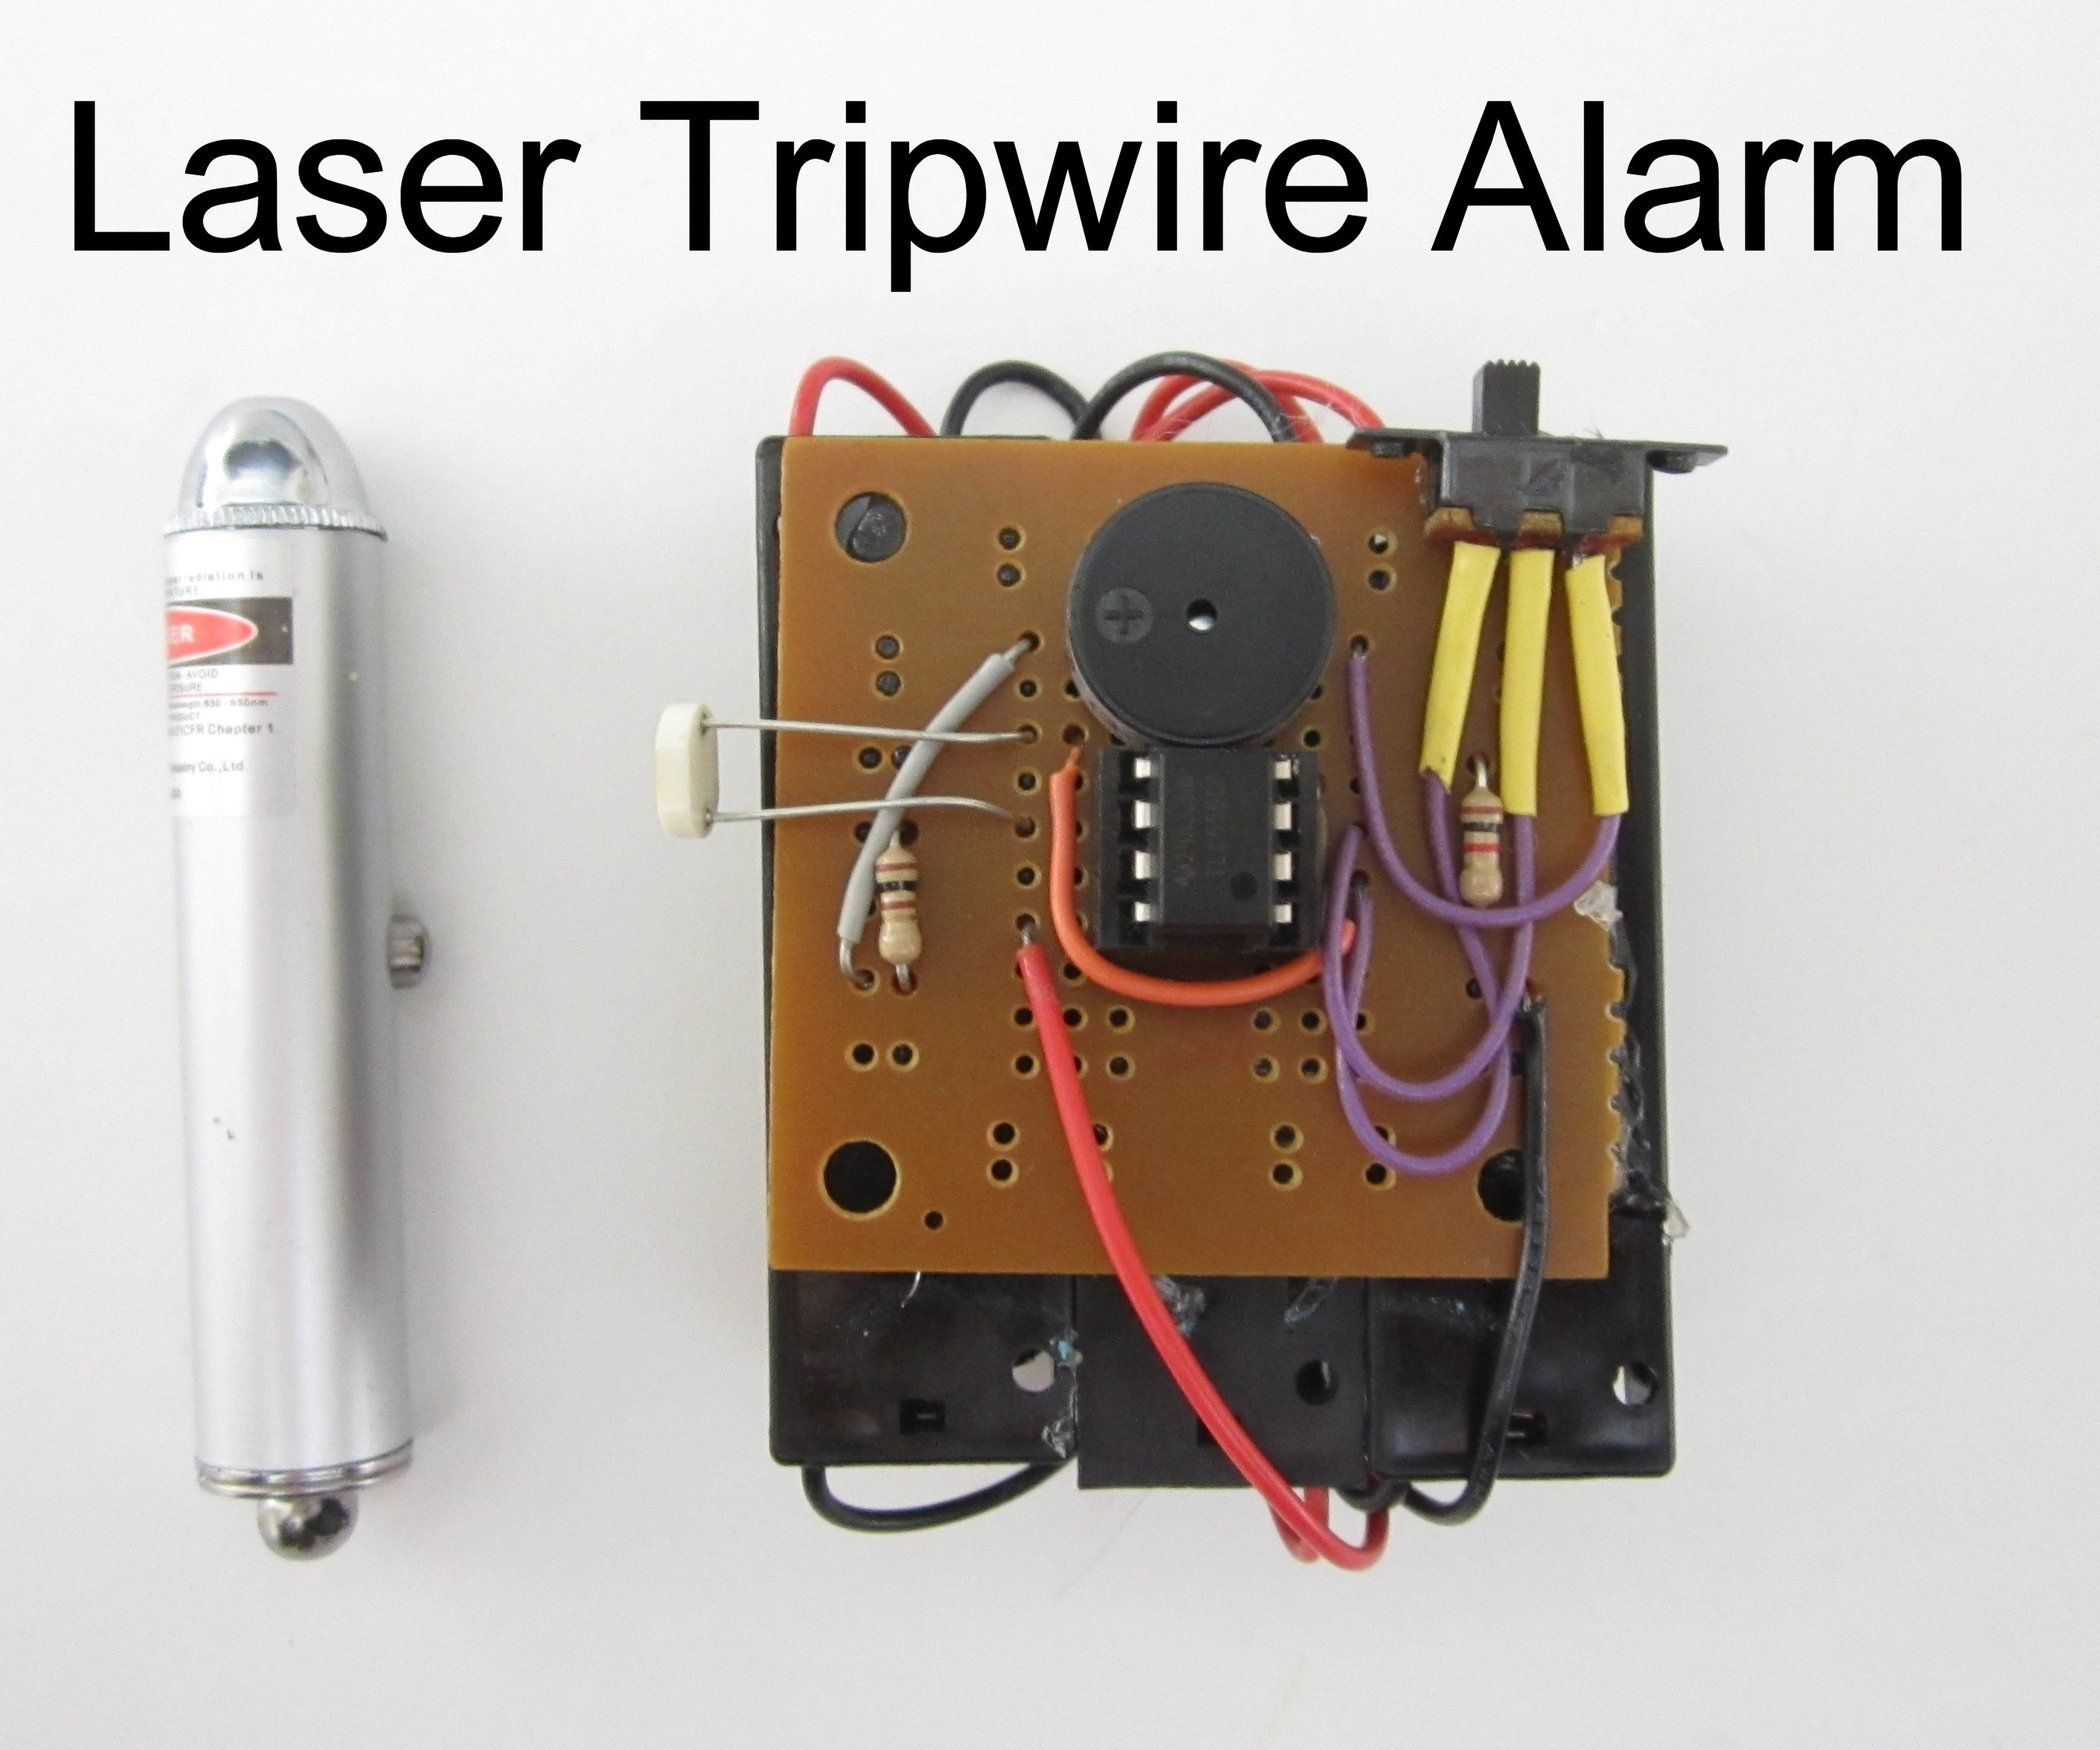 Laser Tripwire Alarm Interesting Laser Tripwire Alarm